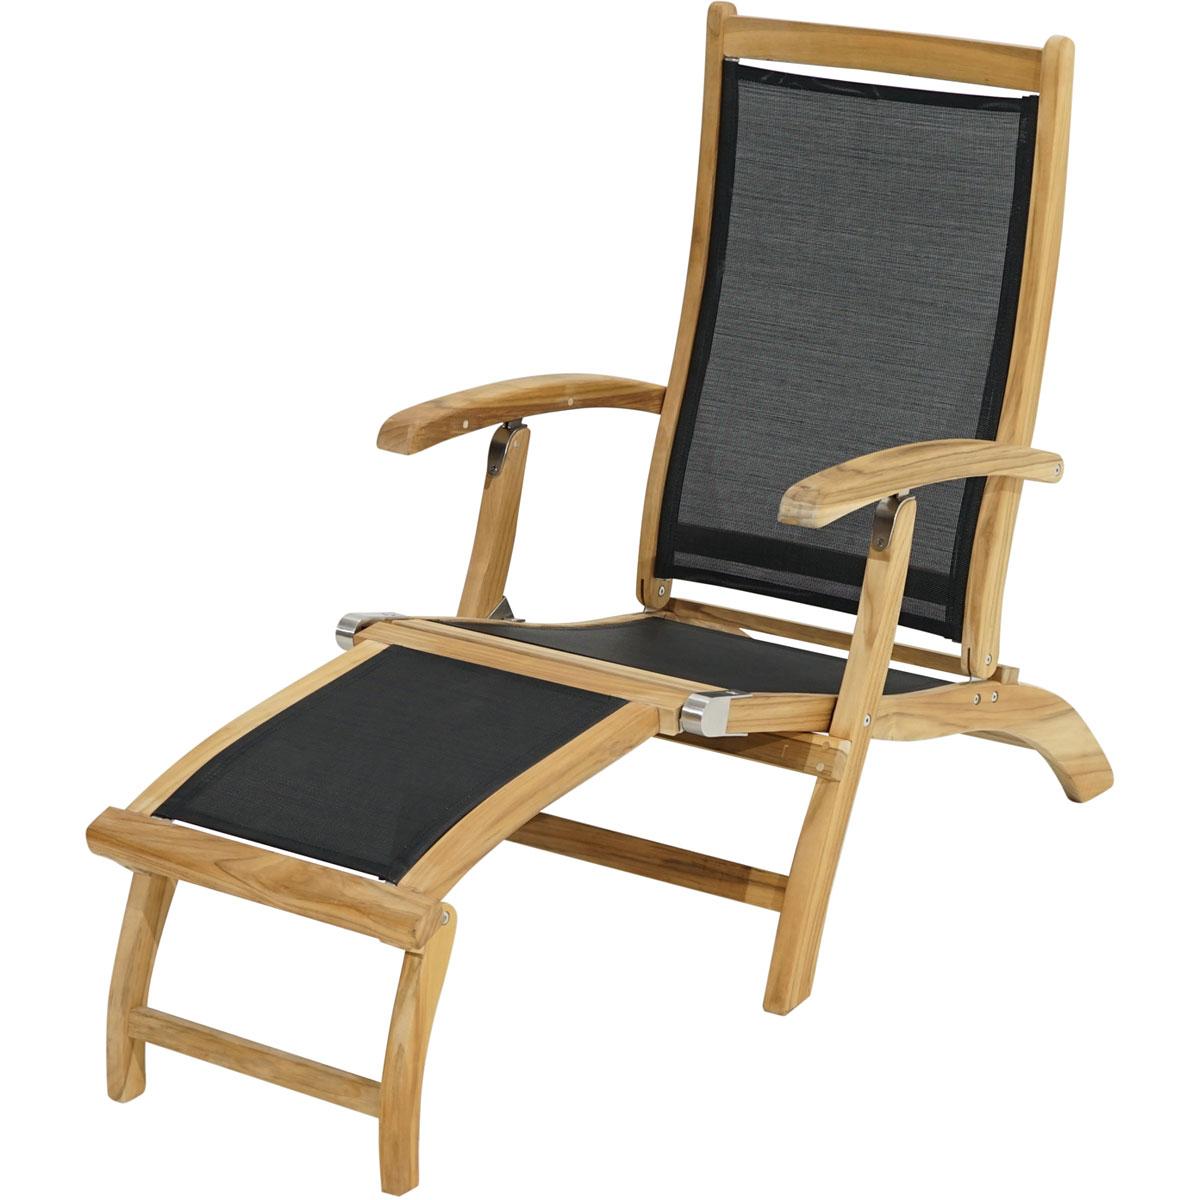 "Gartenstühle - Deckchair ""Fairchild"", 137 160x59x92 cm  - Onlineshop Hellweg"